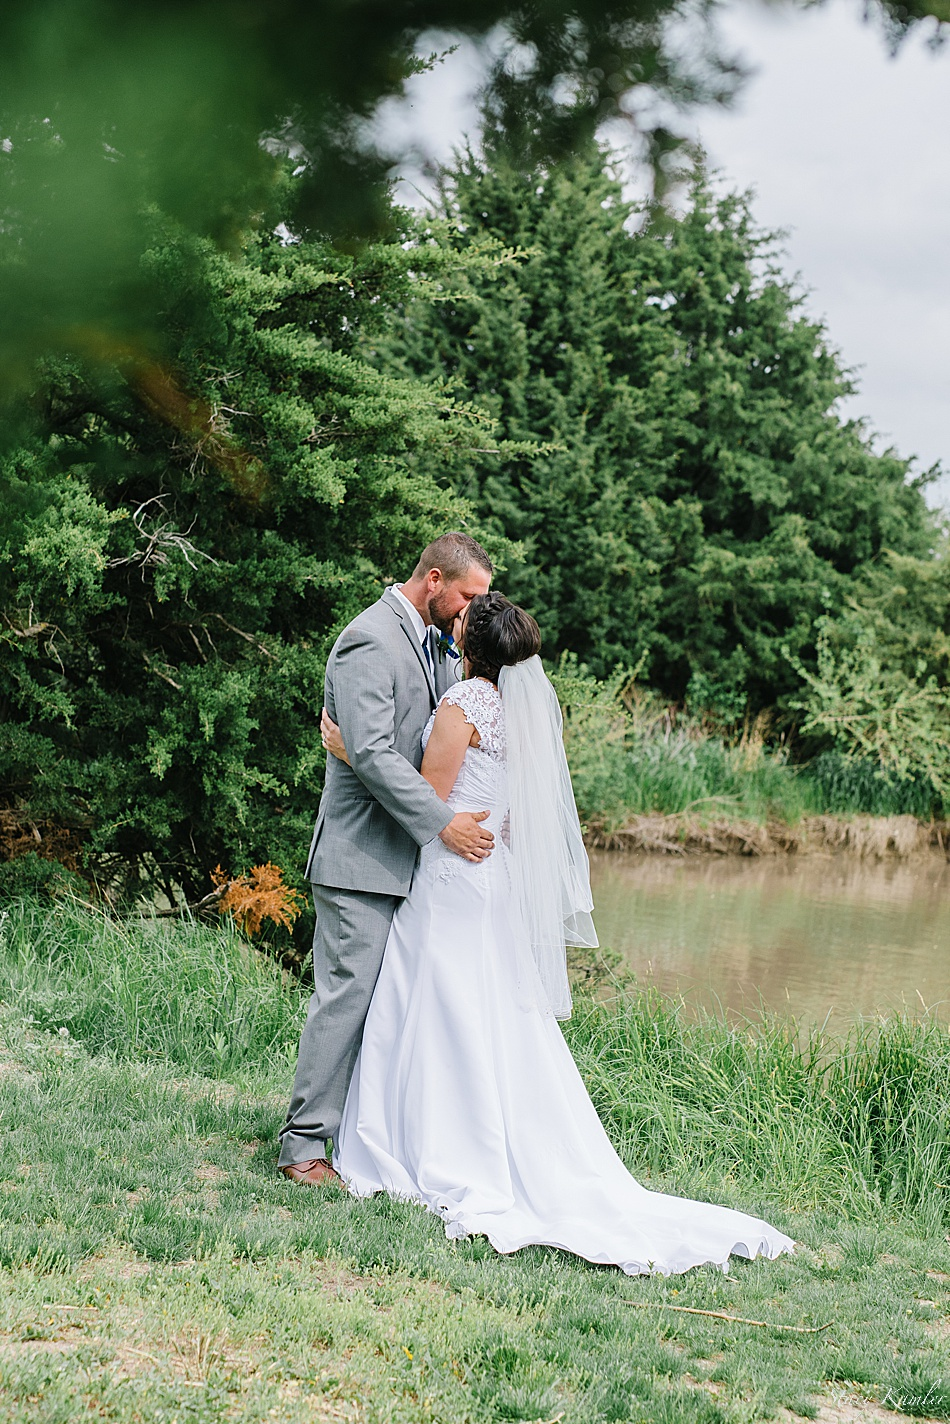 Bride and Groom kissing at Recharge Lake, York, NE